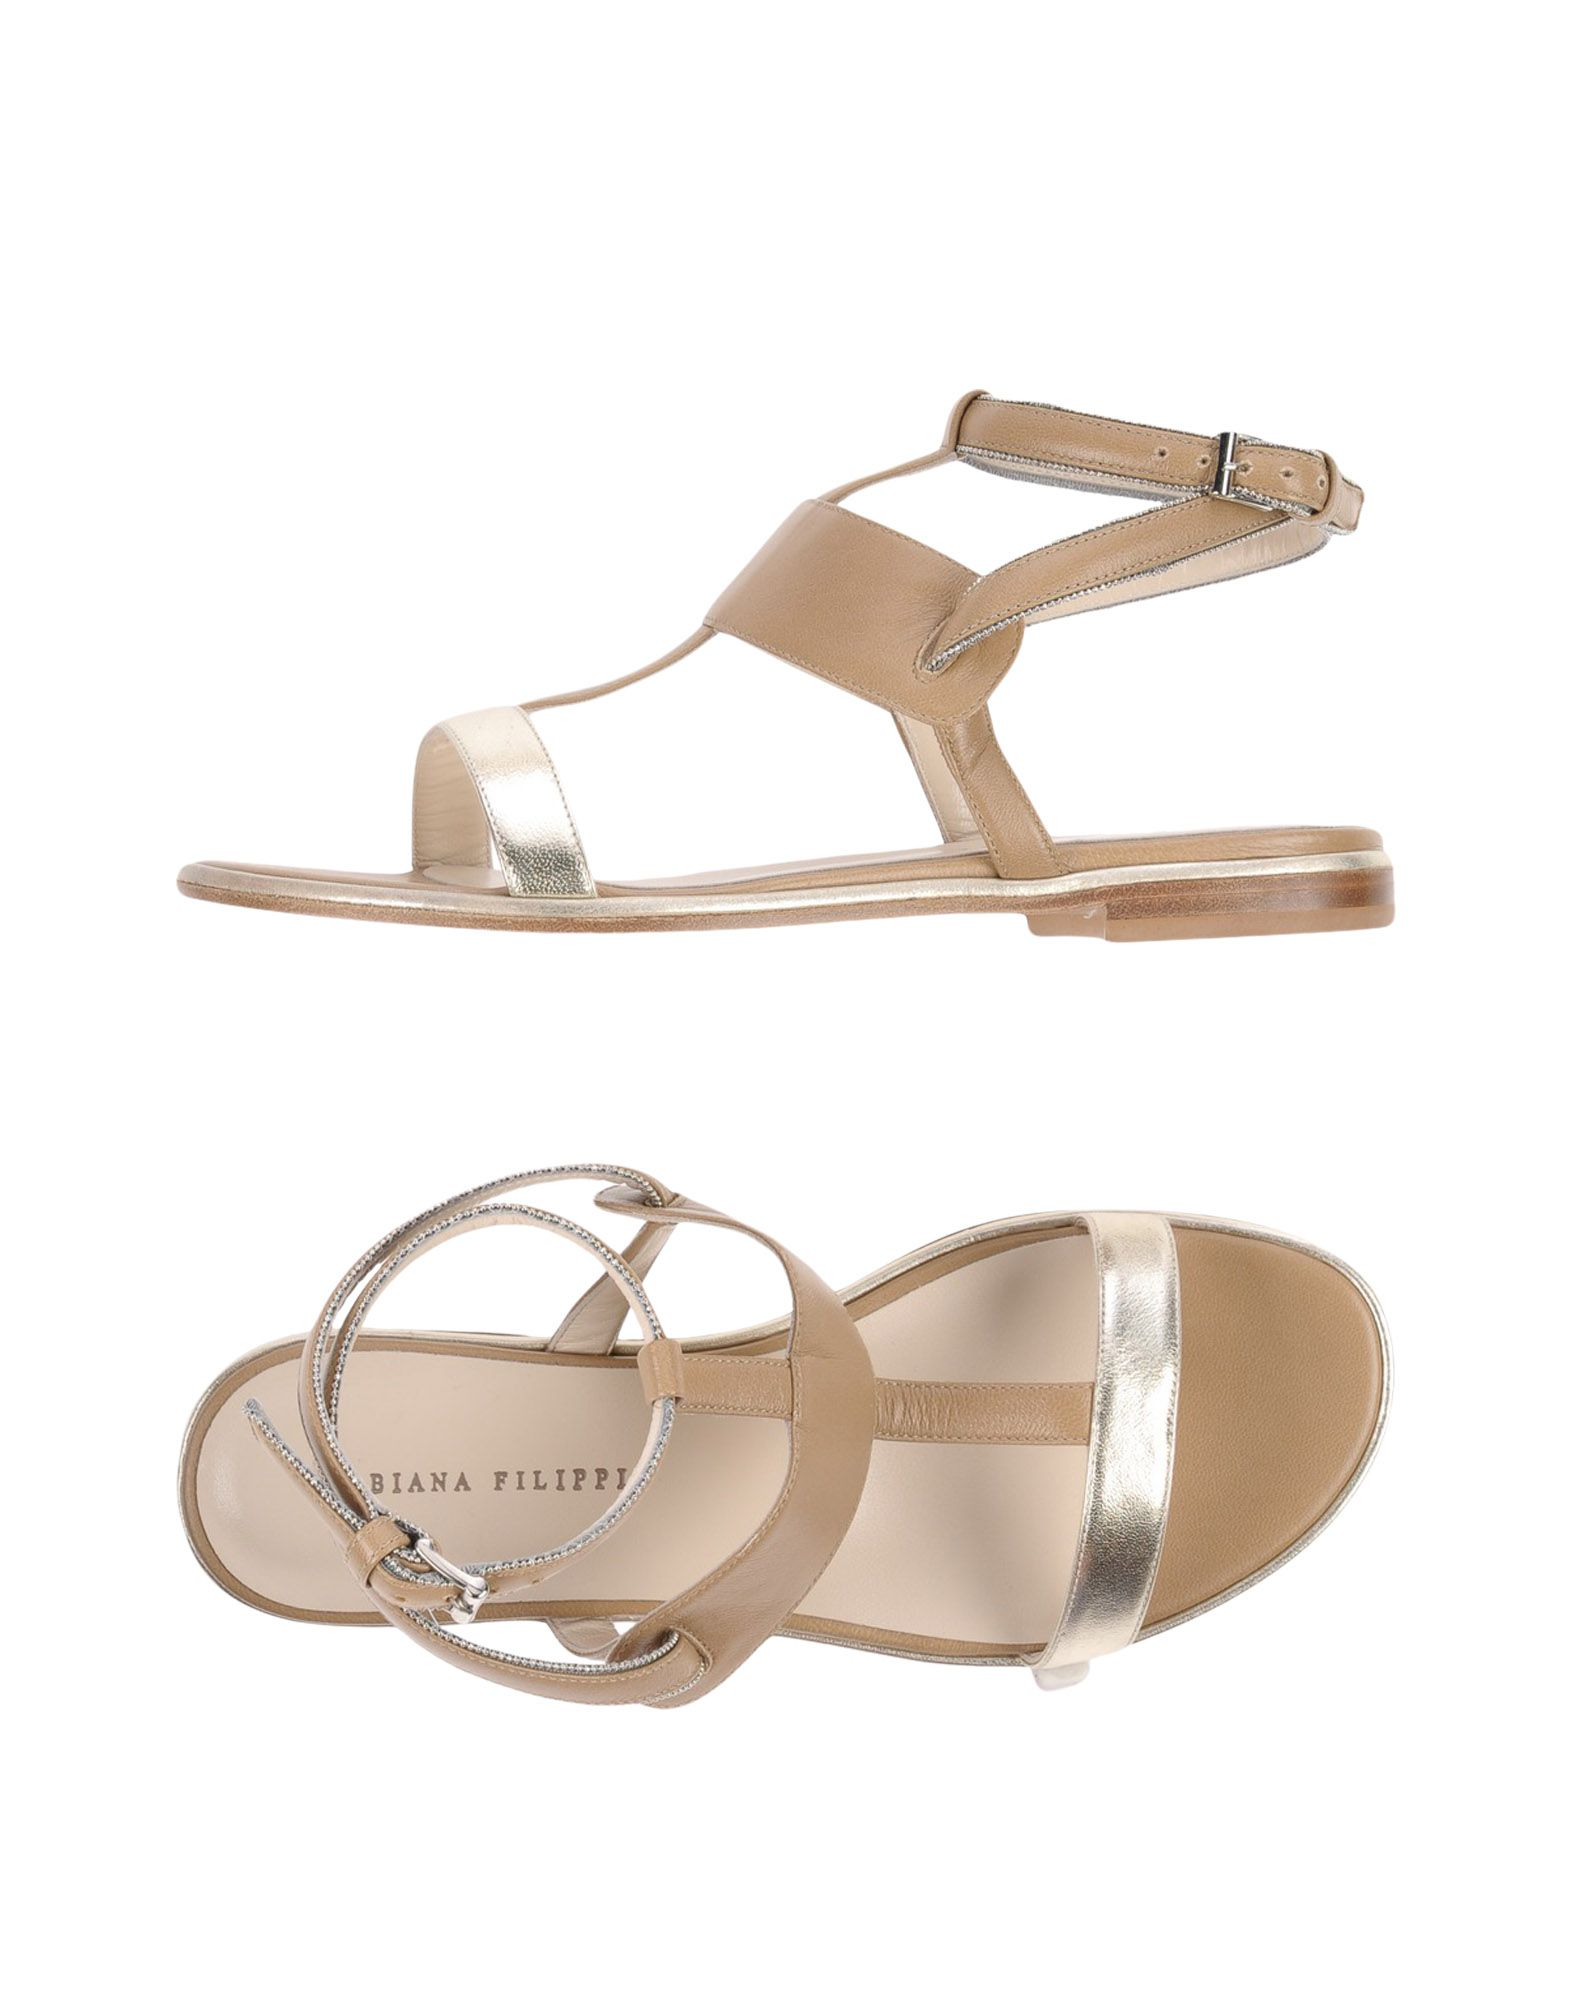 Fabiana Filippi Sandalen Damen  11443855XQGut aussehende strapazierfähige Schuhe